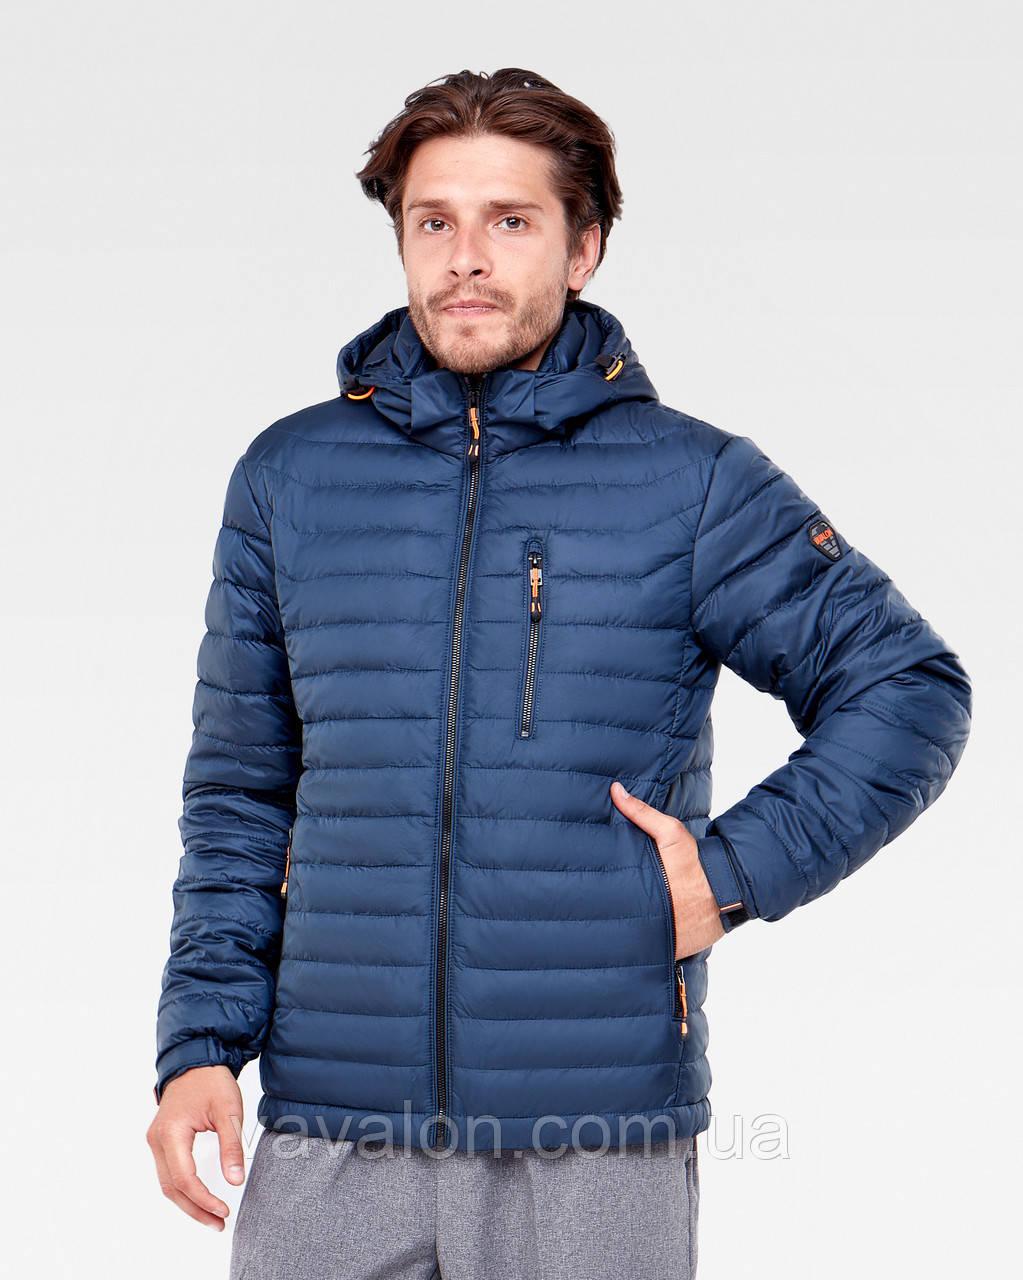 Куртка демисезонная Vavalon KD-908 Sea